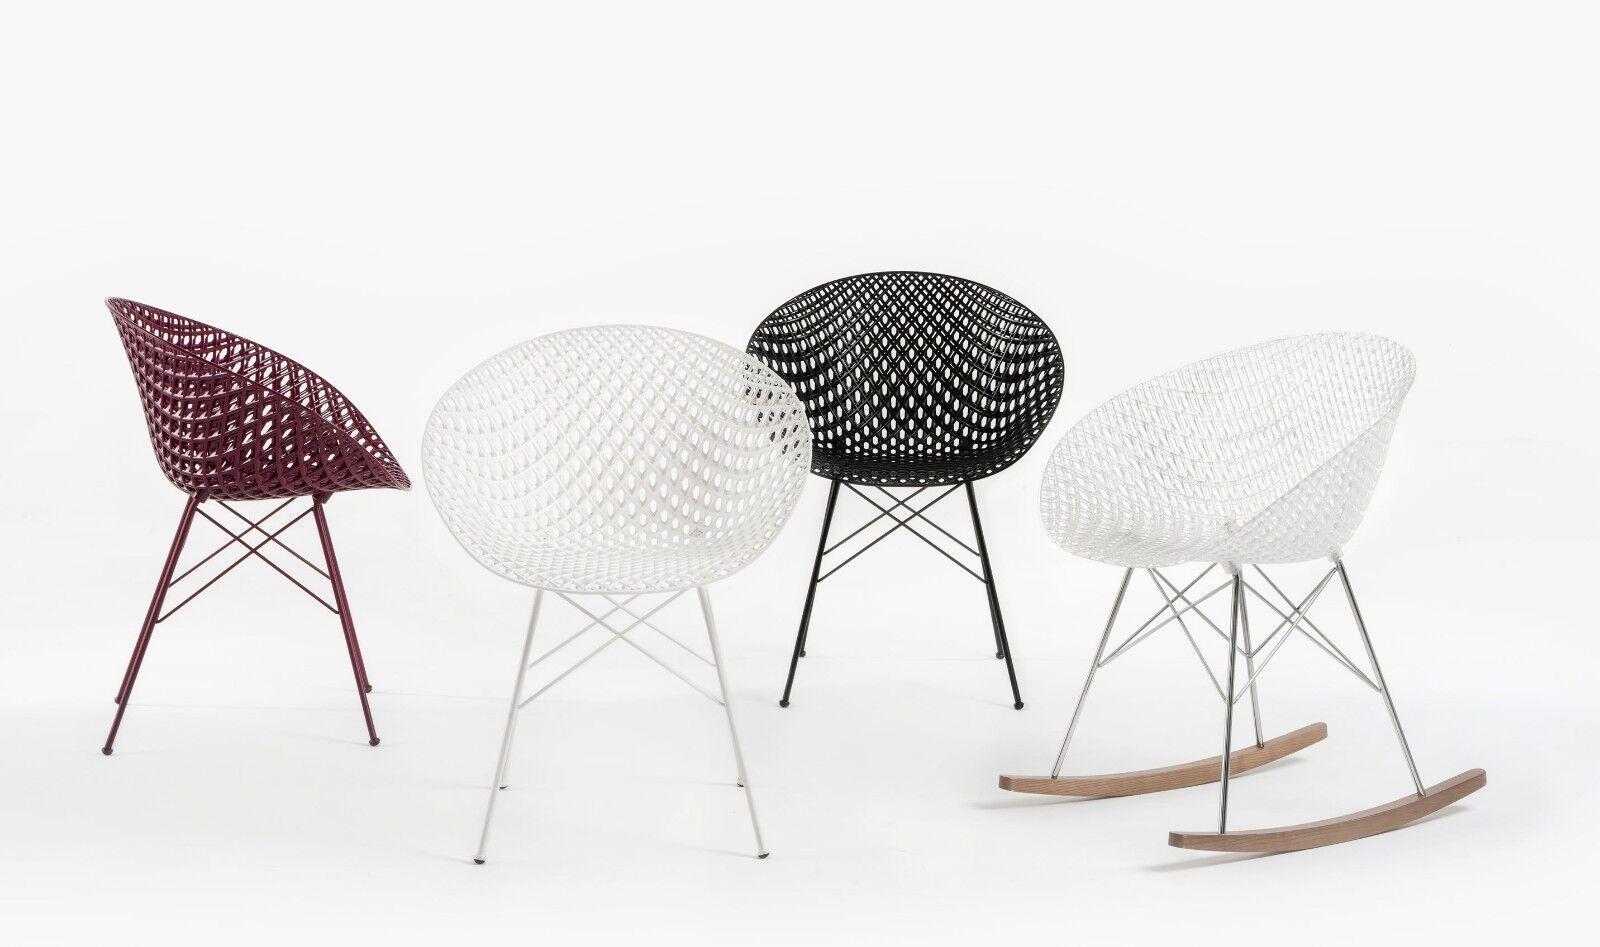 2 sedie Kartell Smatrik Nero 583409 poltrona Design moderno Nuove da outlet